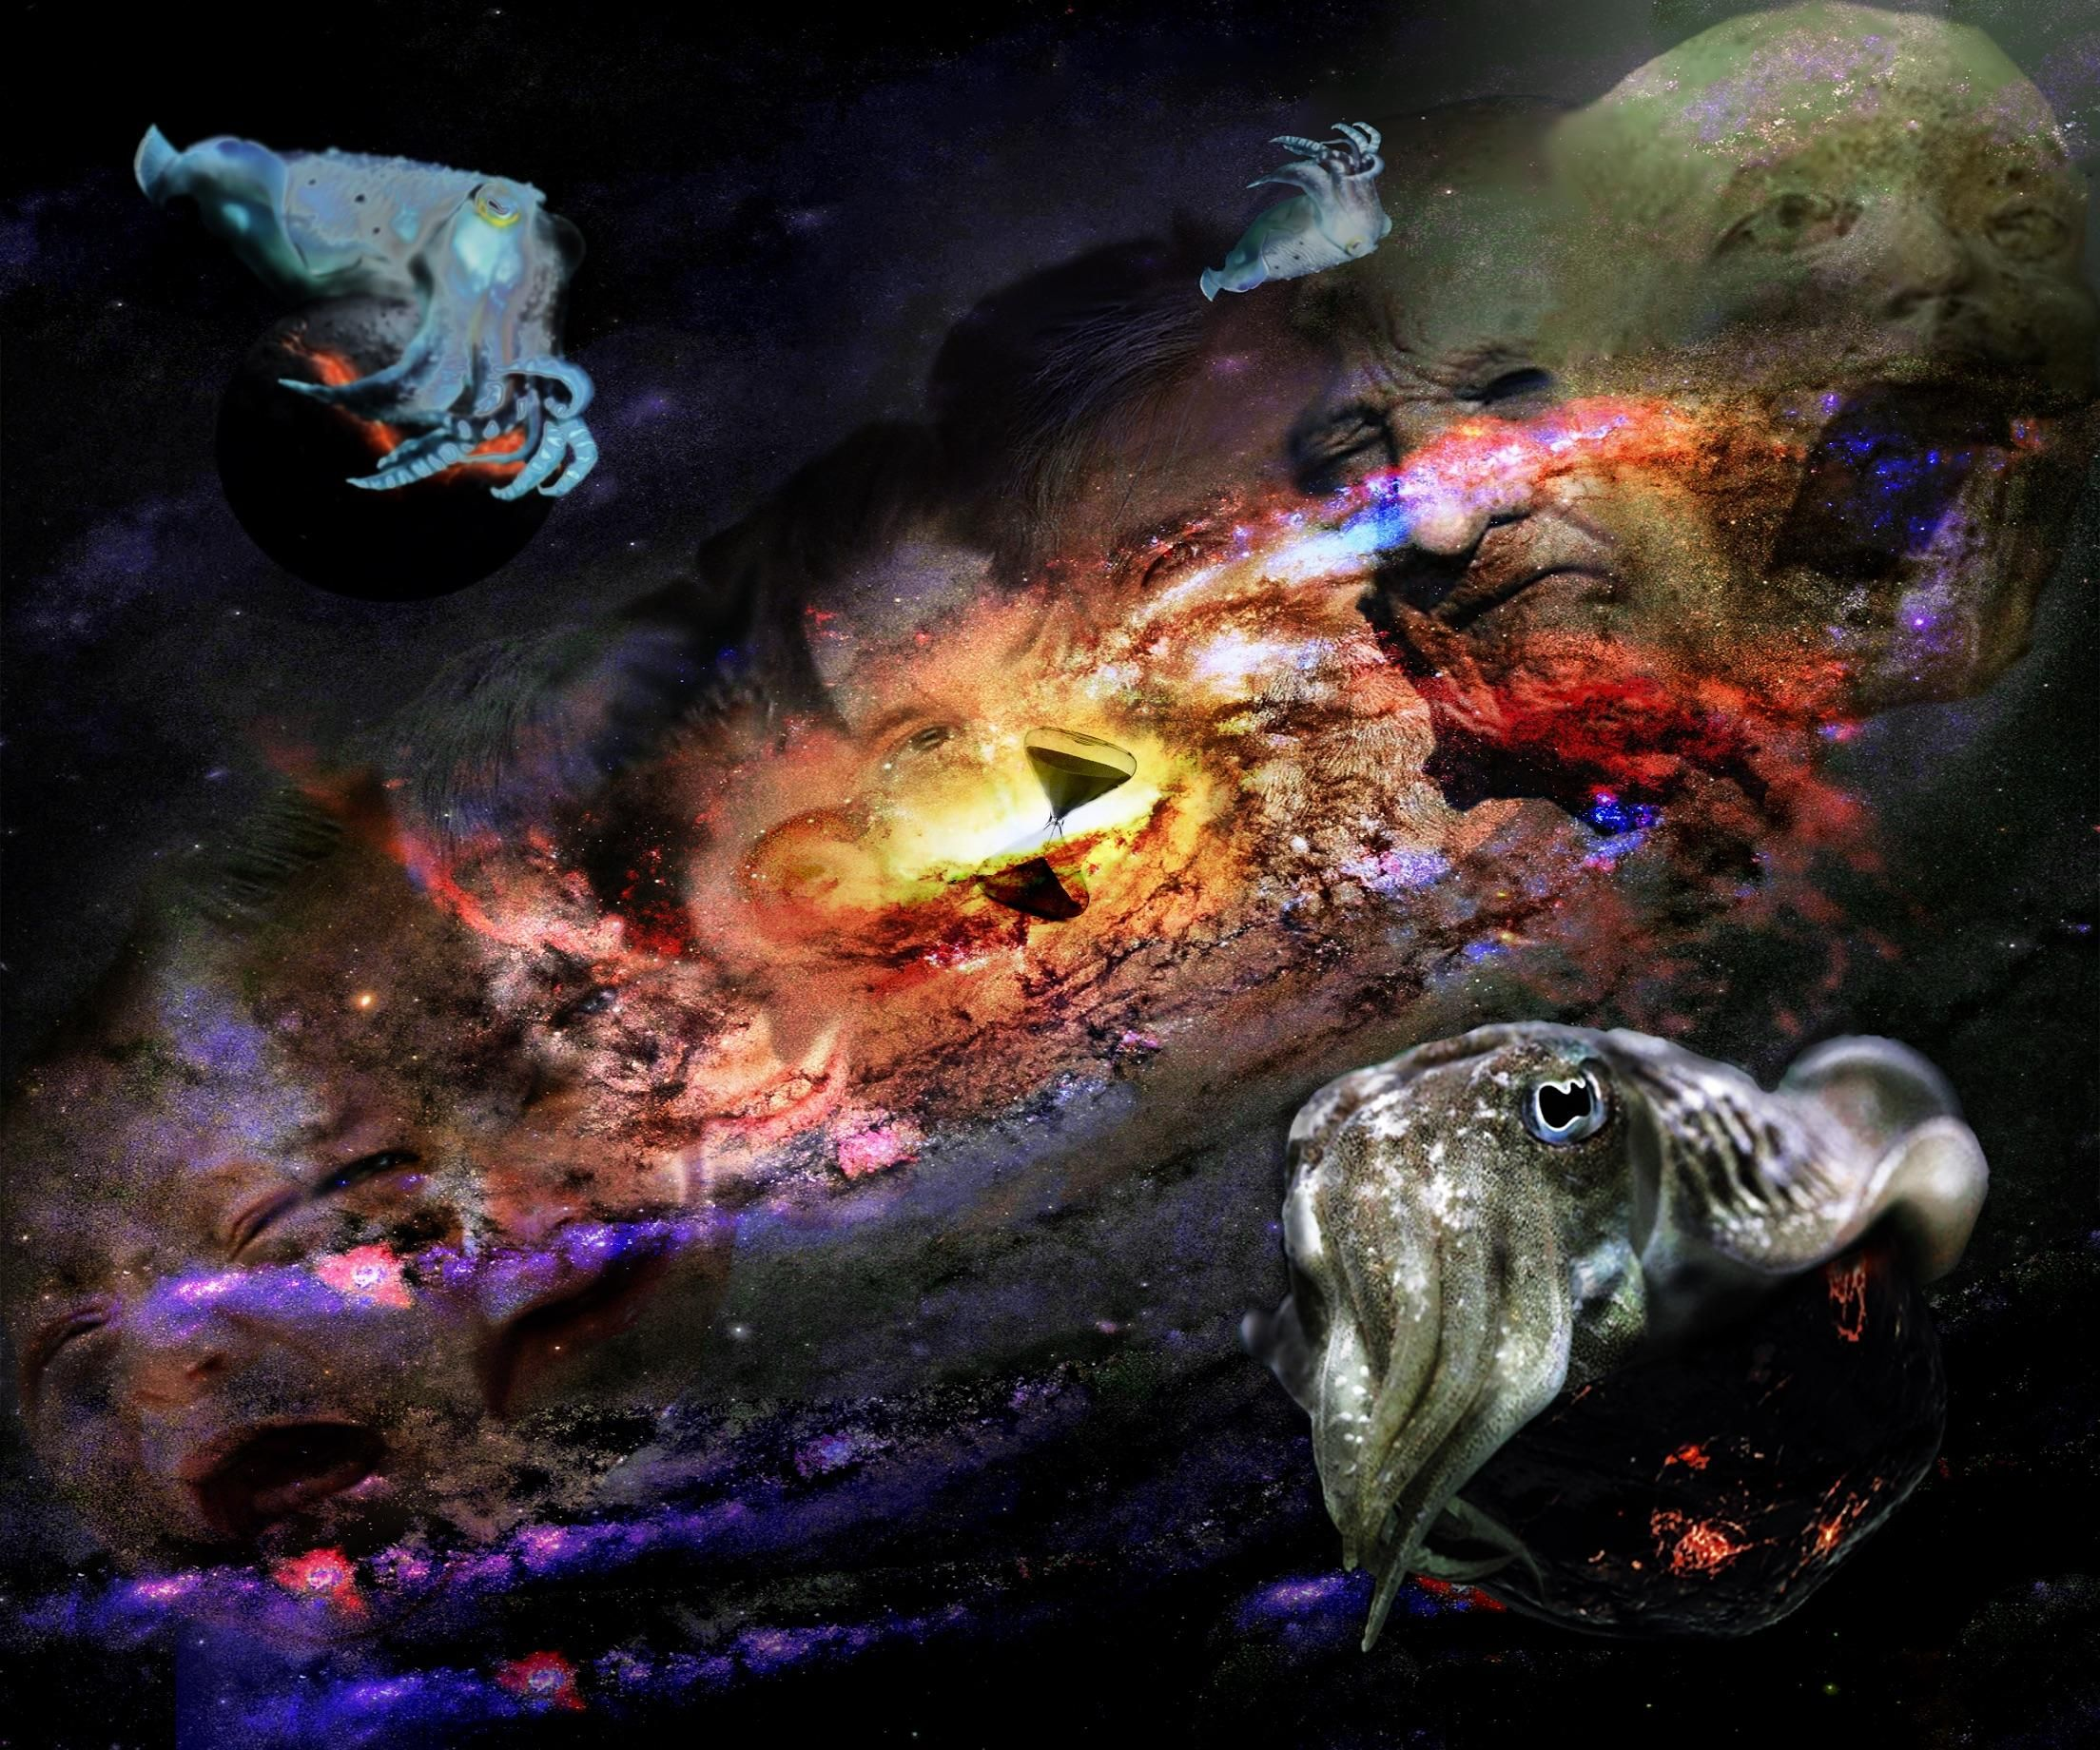 The Cosmos Photoshop 12x10 300dpi http://ift.tt/2ziudDW